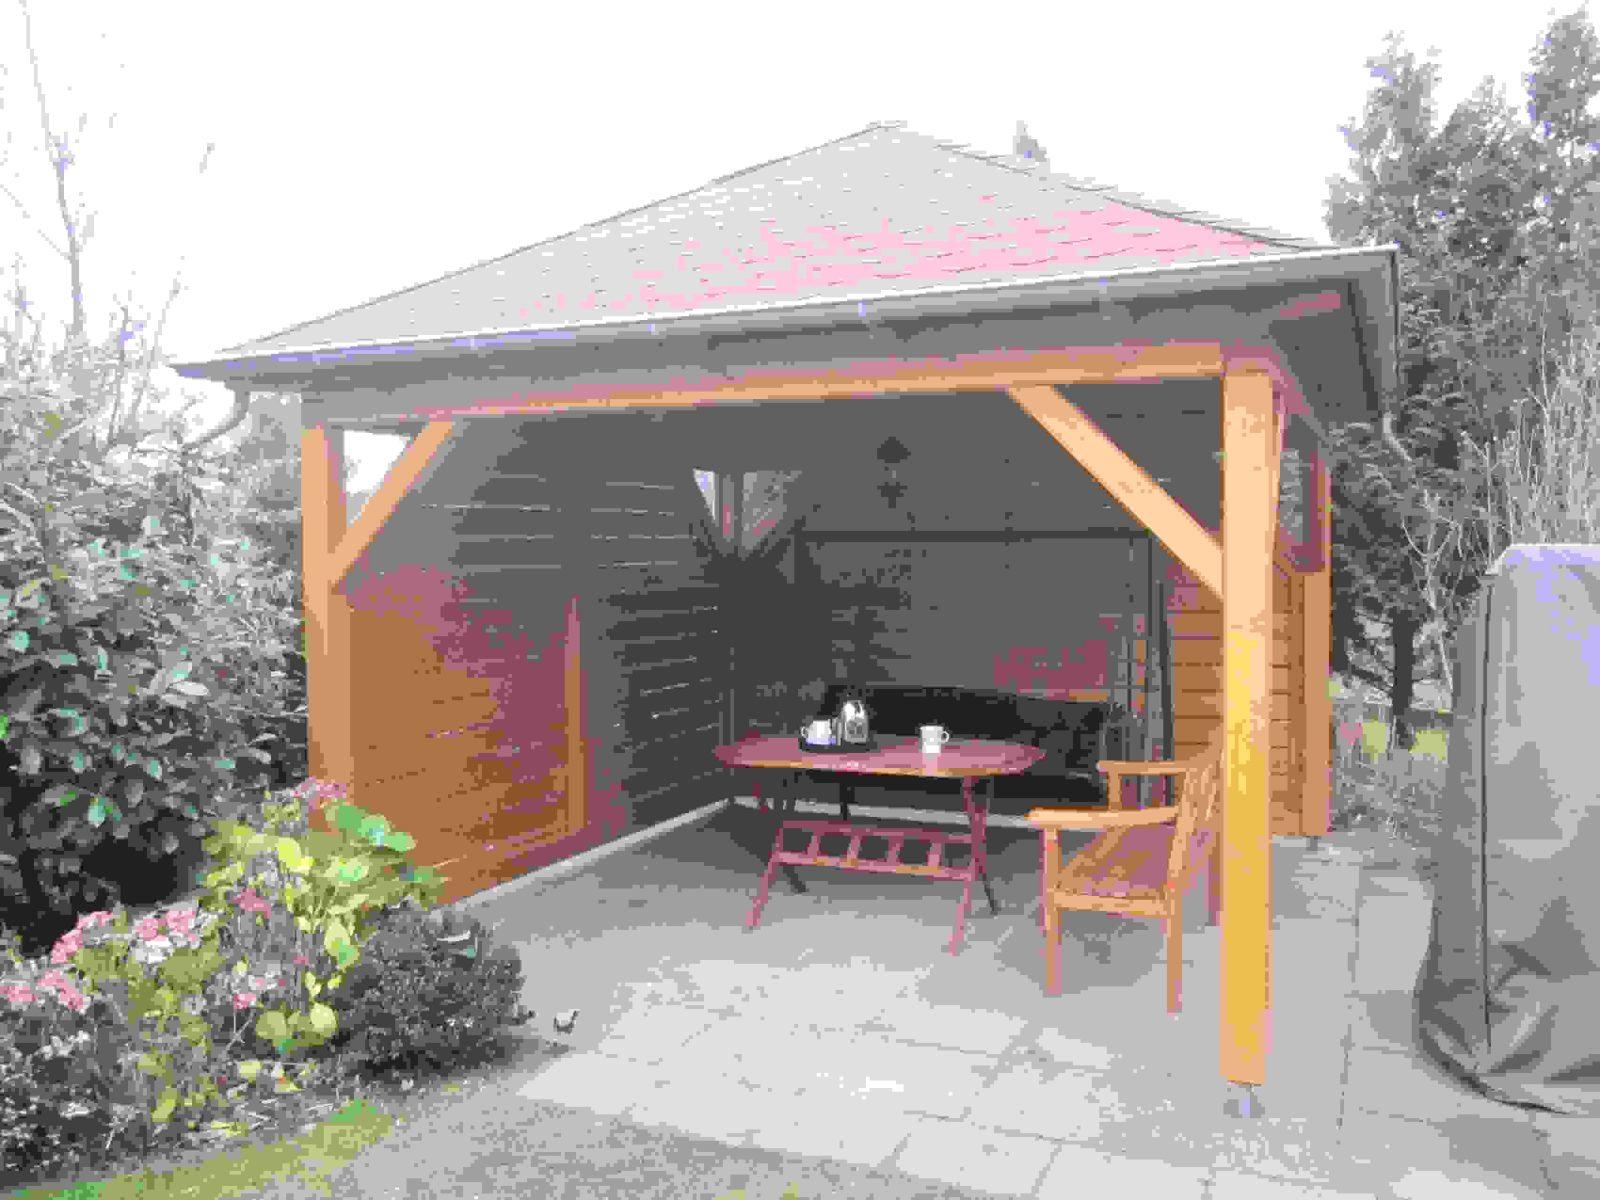 Frisch 40 Gartenpavillon Holz Selber Bauen Design  Einzigartiger Garten von Holz Pavillon 3X4 Selber Bauen Photo